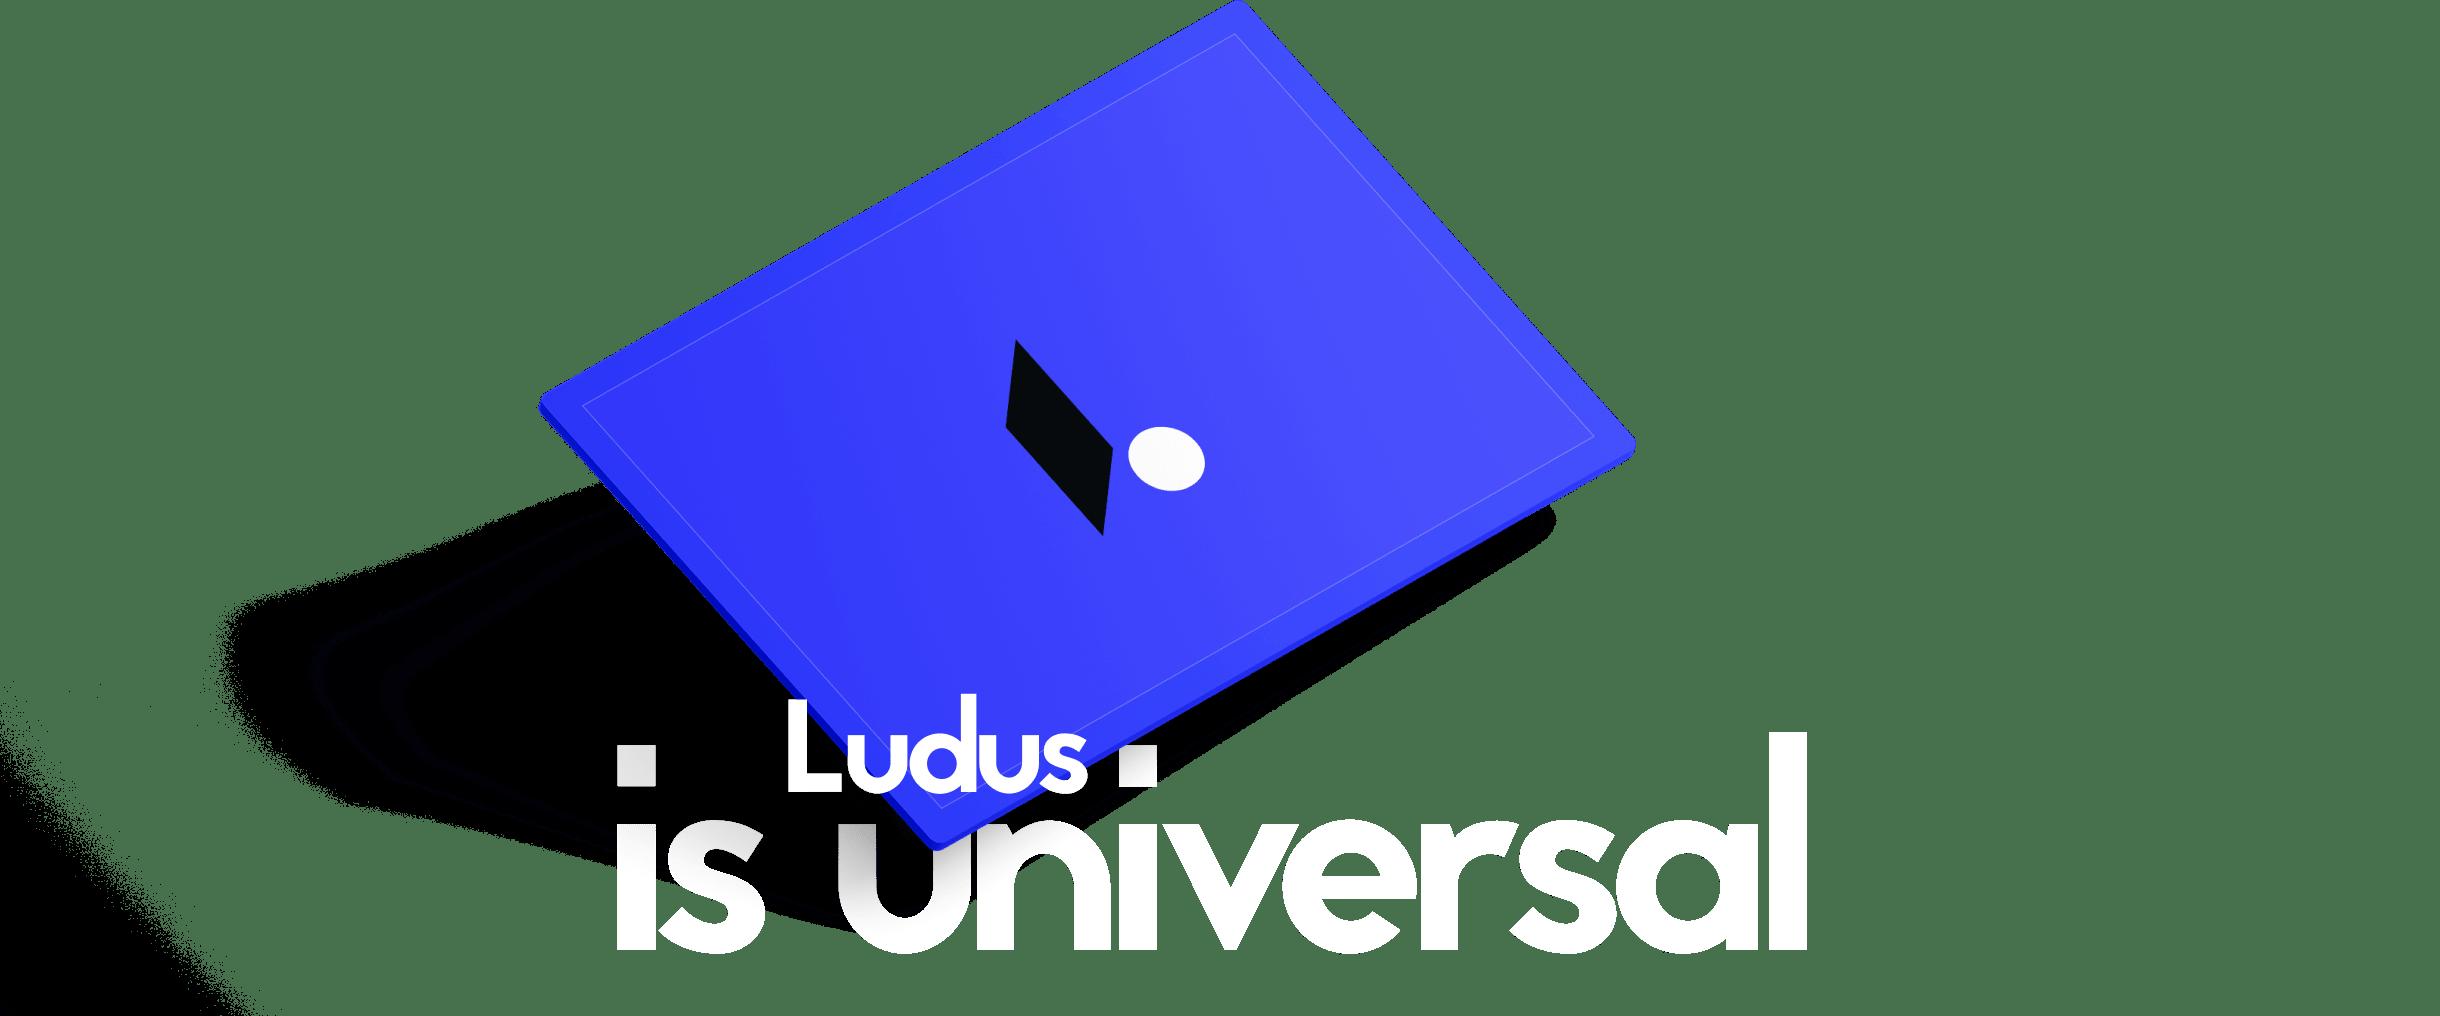 Ludus is universal